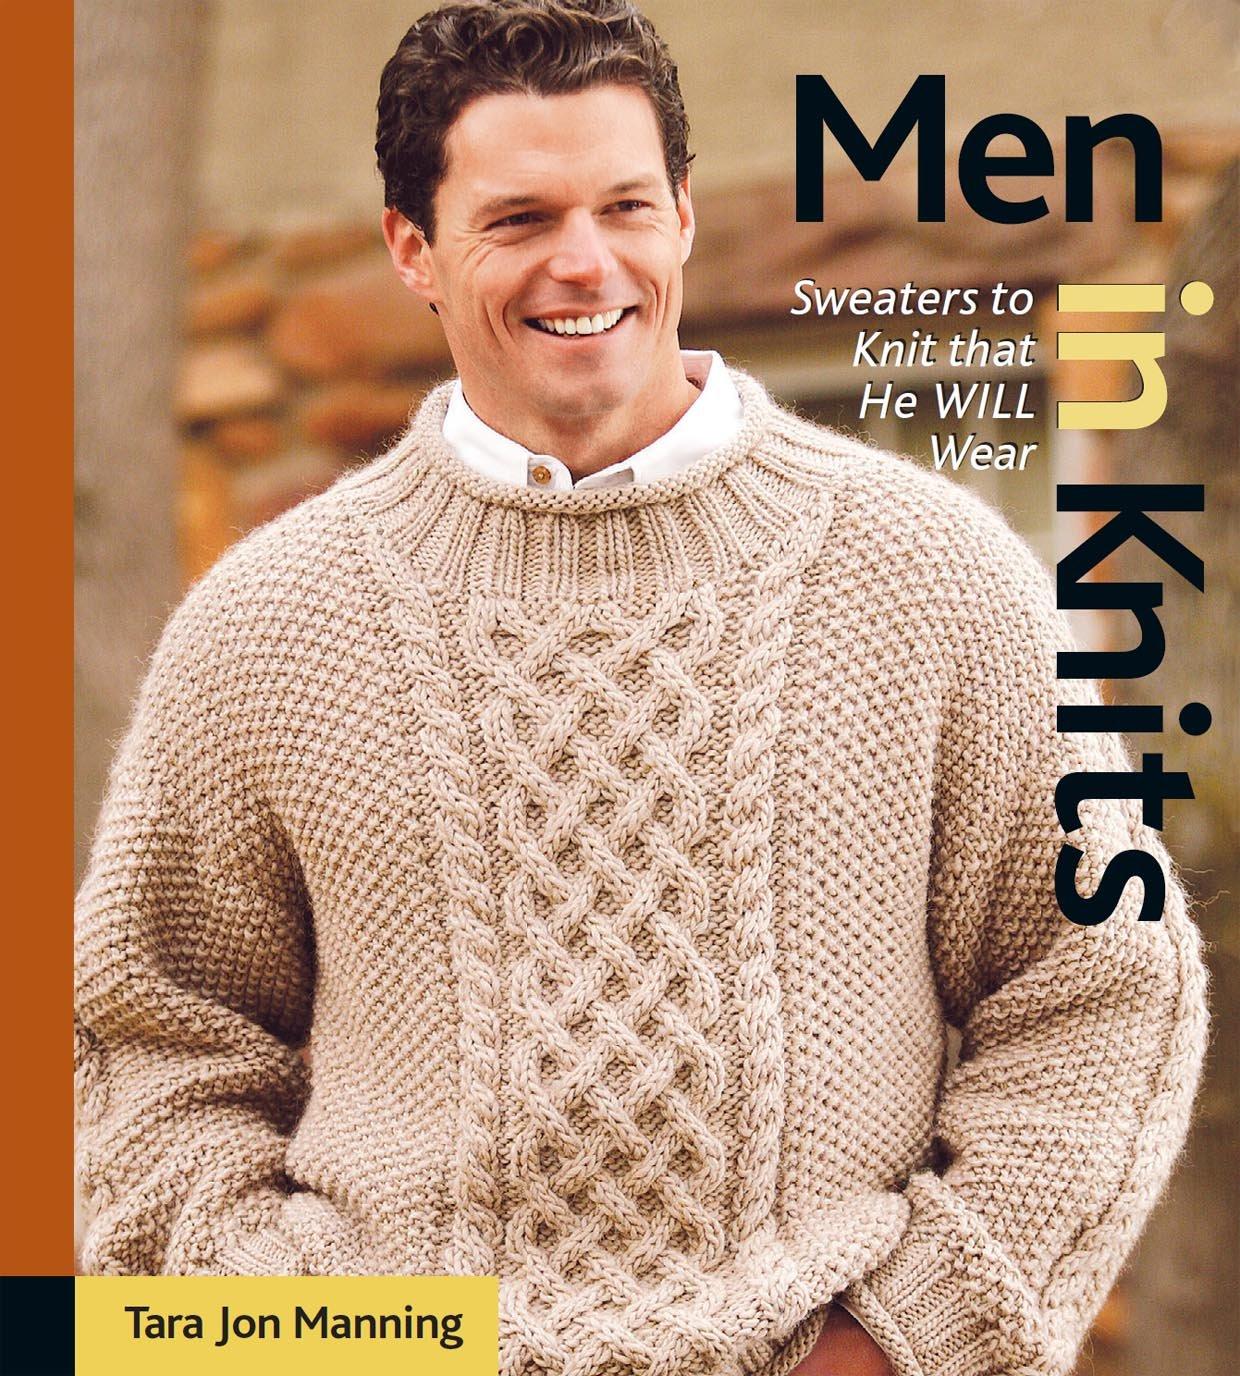 Men in Knits: Tara Jon Manning: 9781931499231: Amazon.com: Books